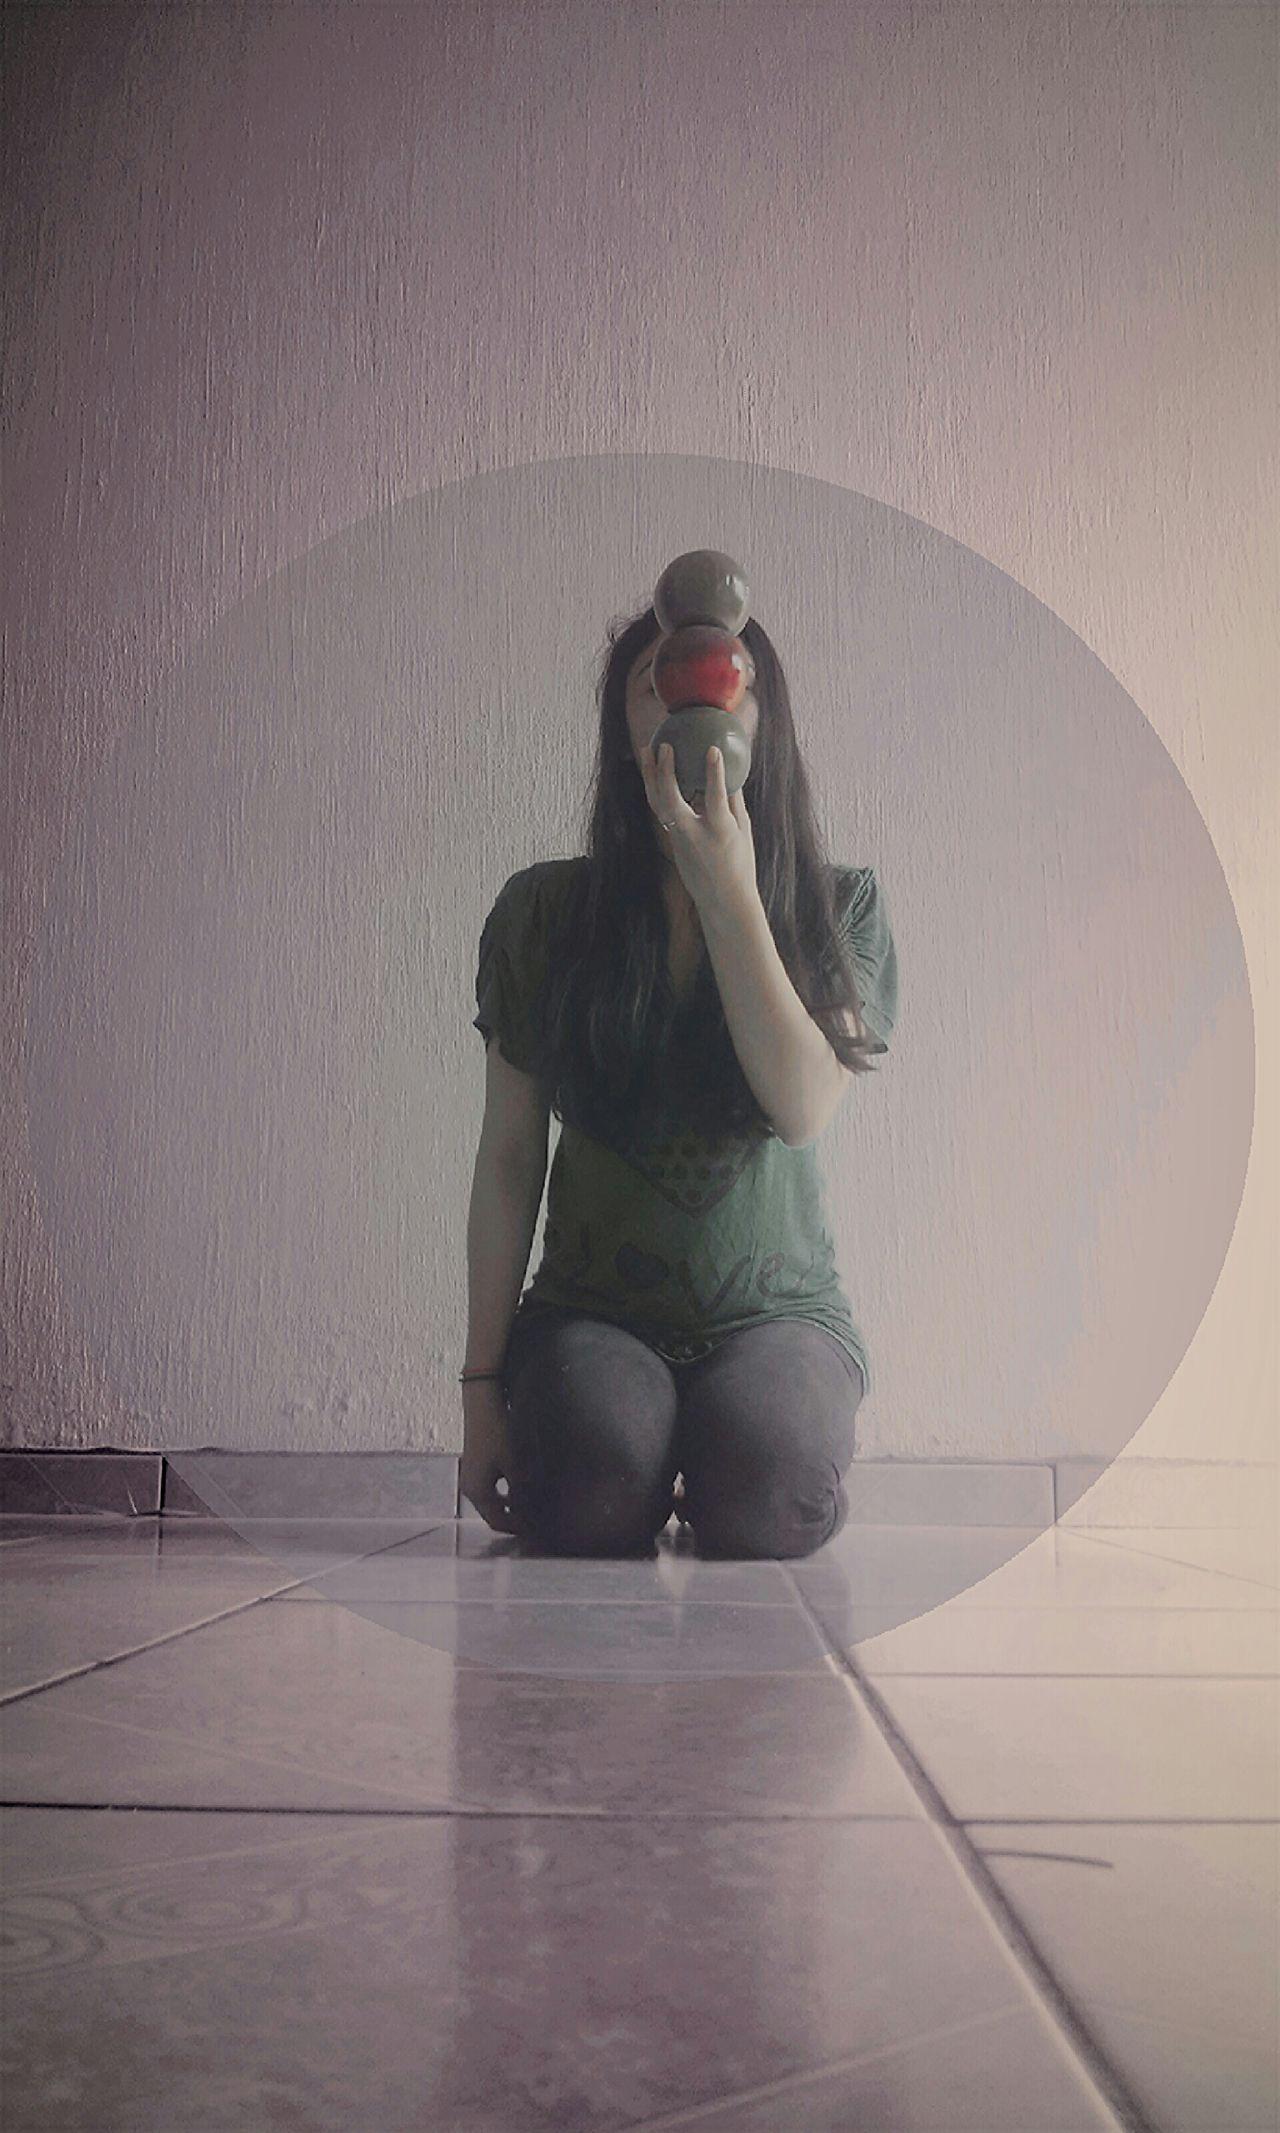 Lo único que alcanza a oír es el eco interrumpido del silencio. 🍂 Day Photo Silence Photography Perdida Human Face Sola Faces Of EyeEm Person Phothograph First Eyeem Photo Human Eye